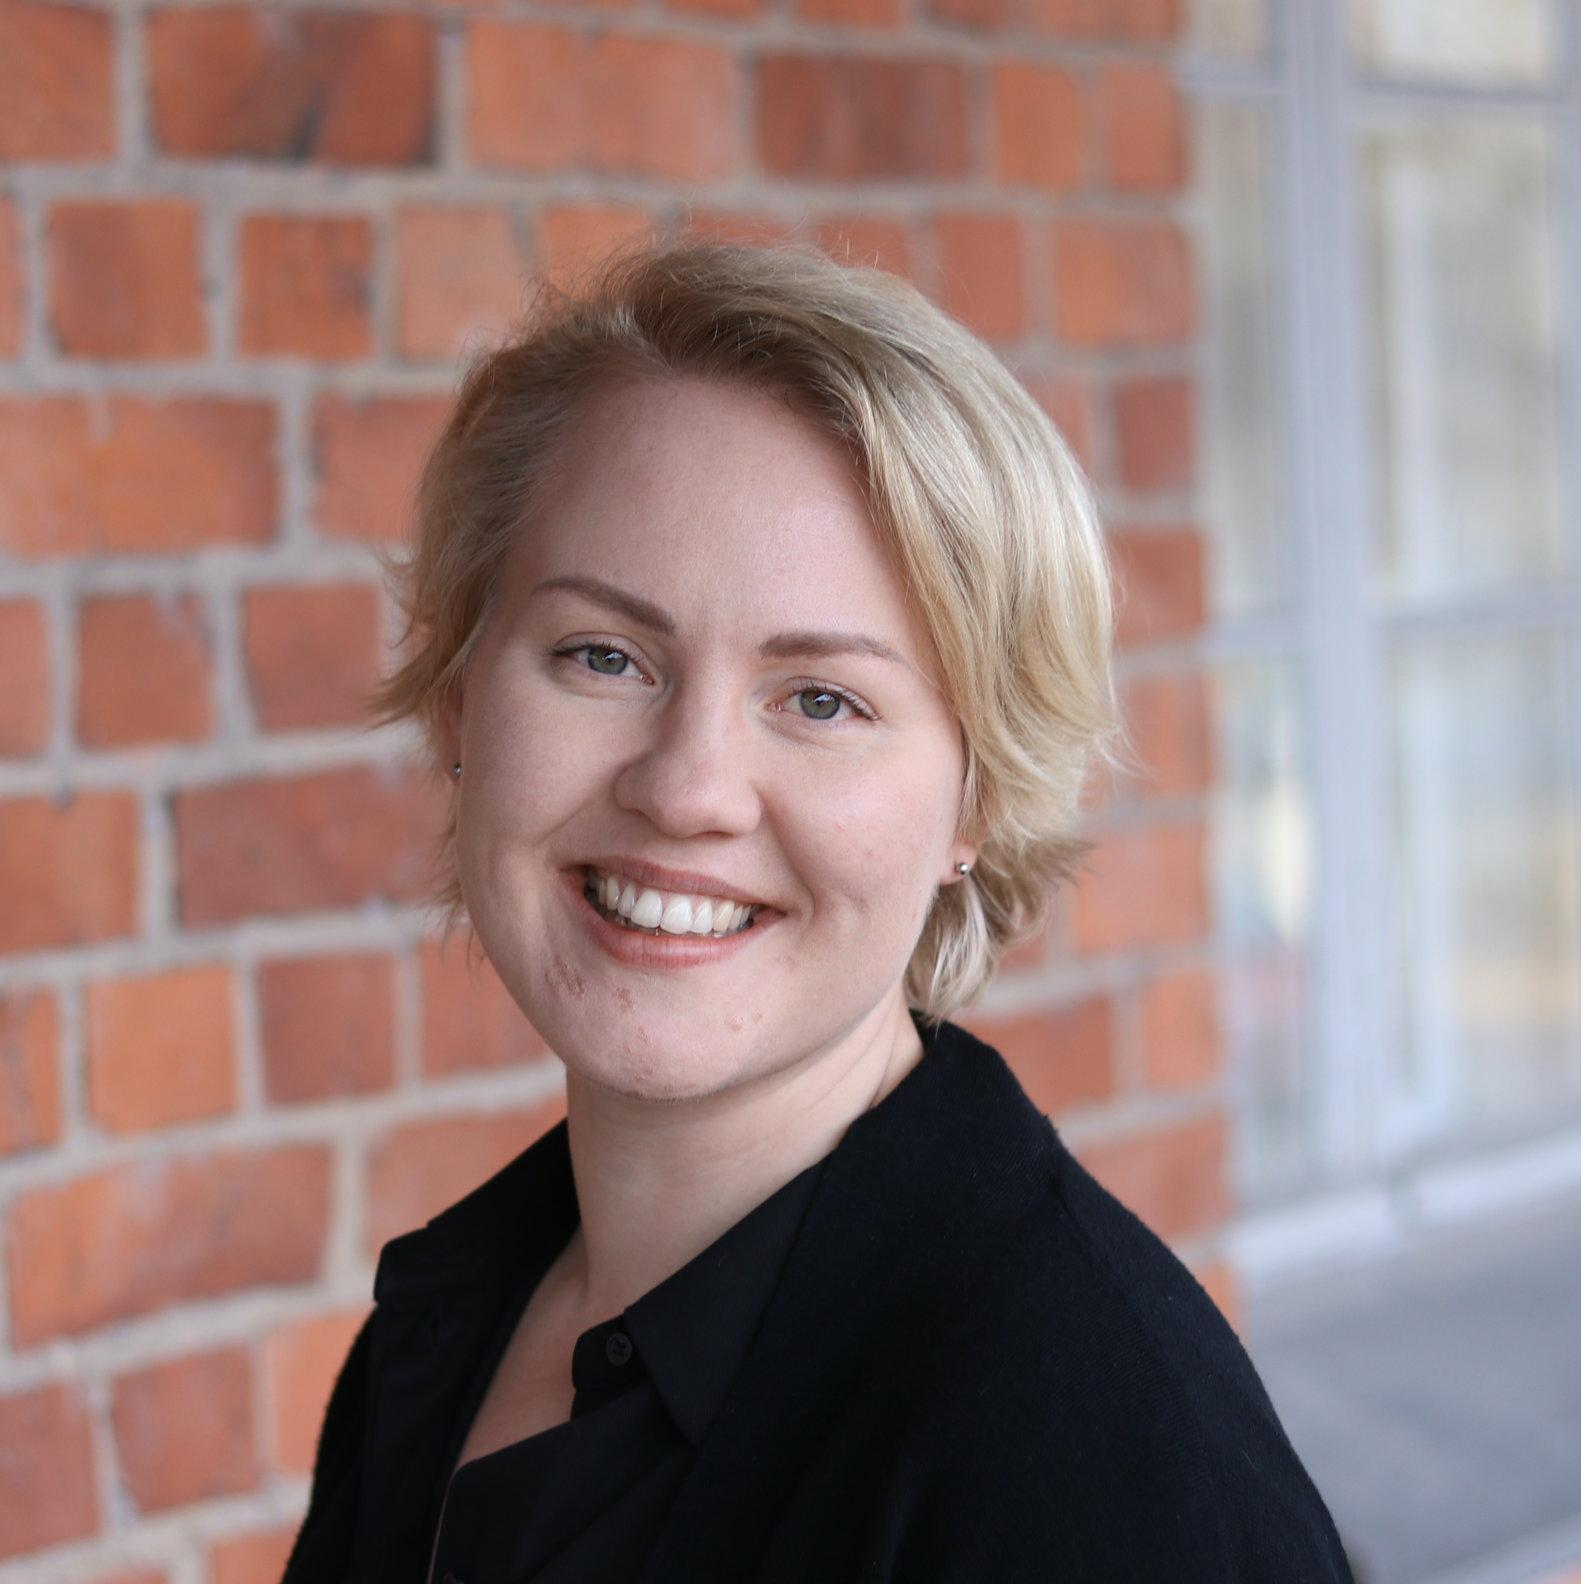 Anna Holopainen